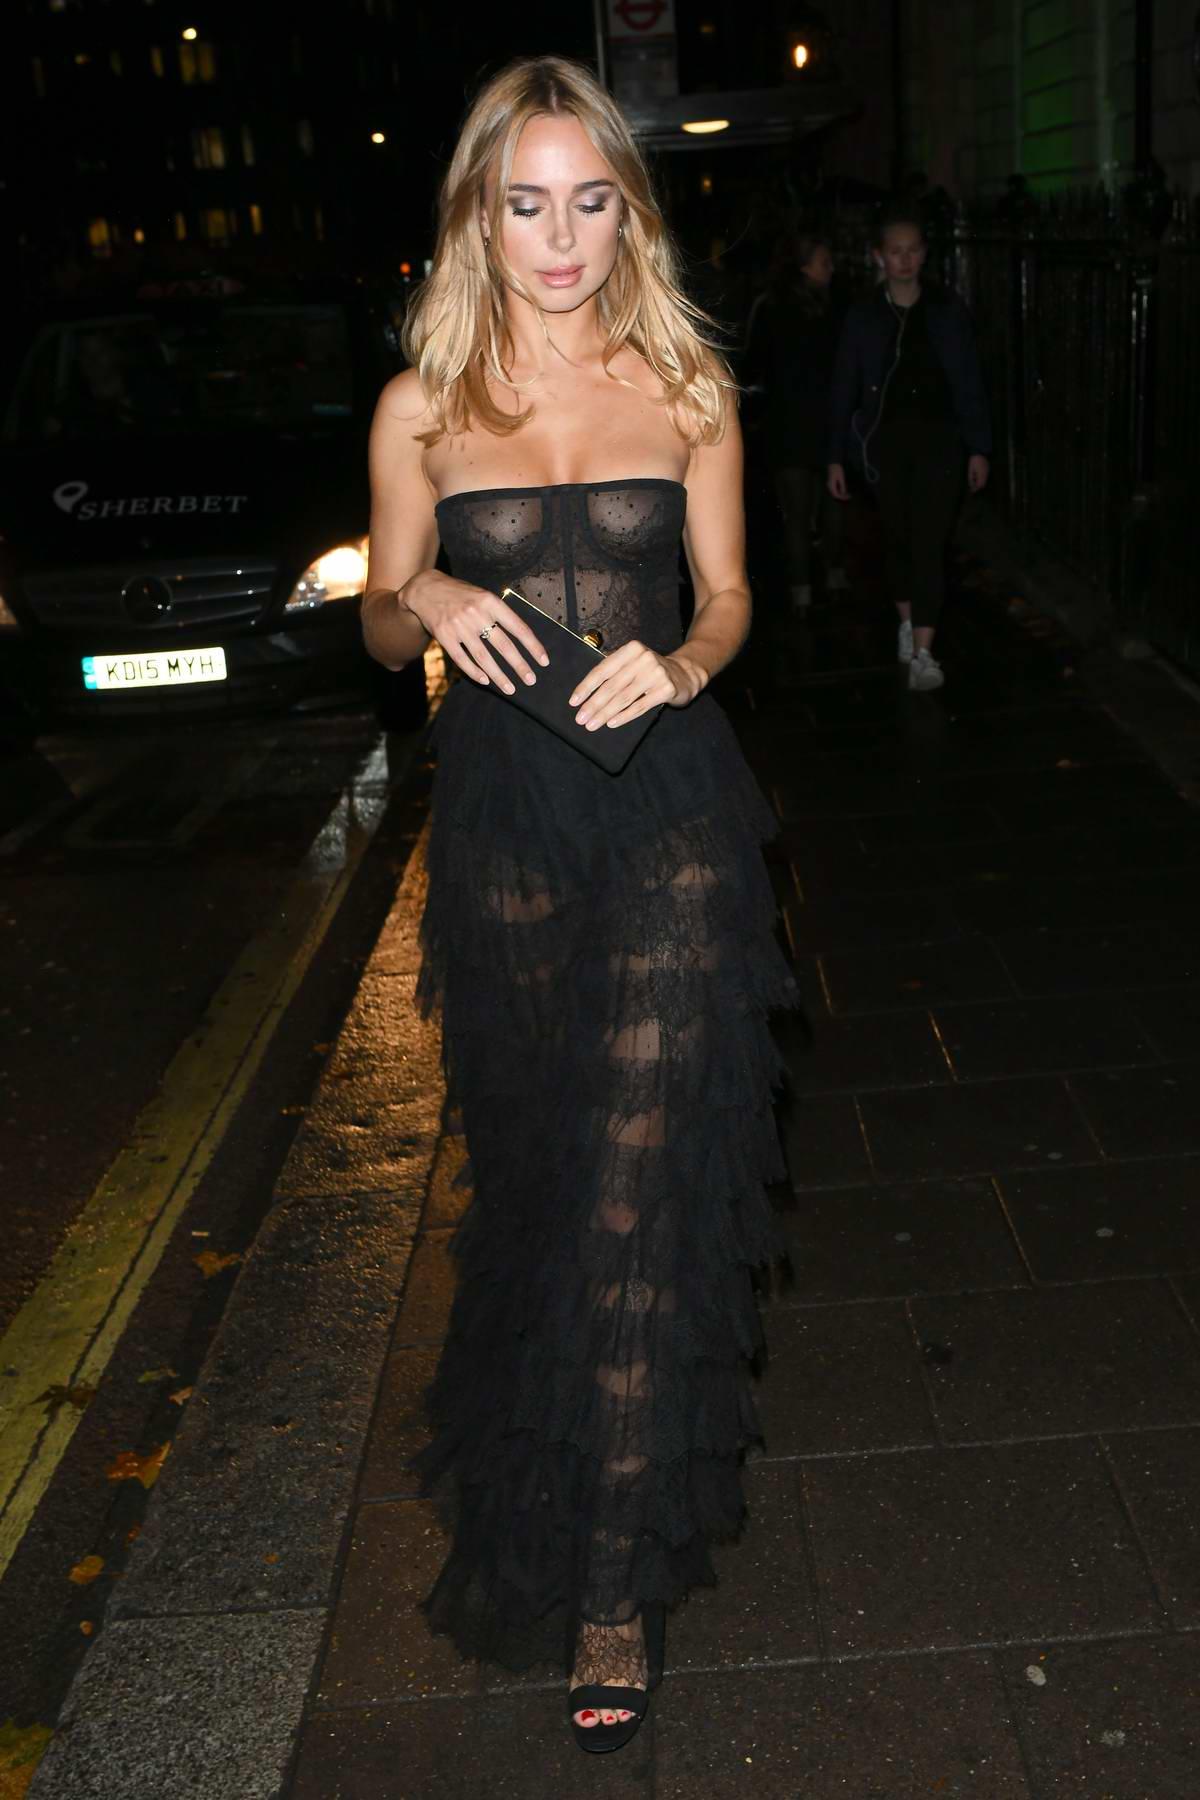 Kimberley Garner wears a black sheer dress while attending International Day Of The Girl Gala at Annabel's in London, UK